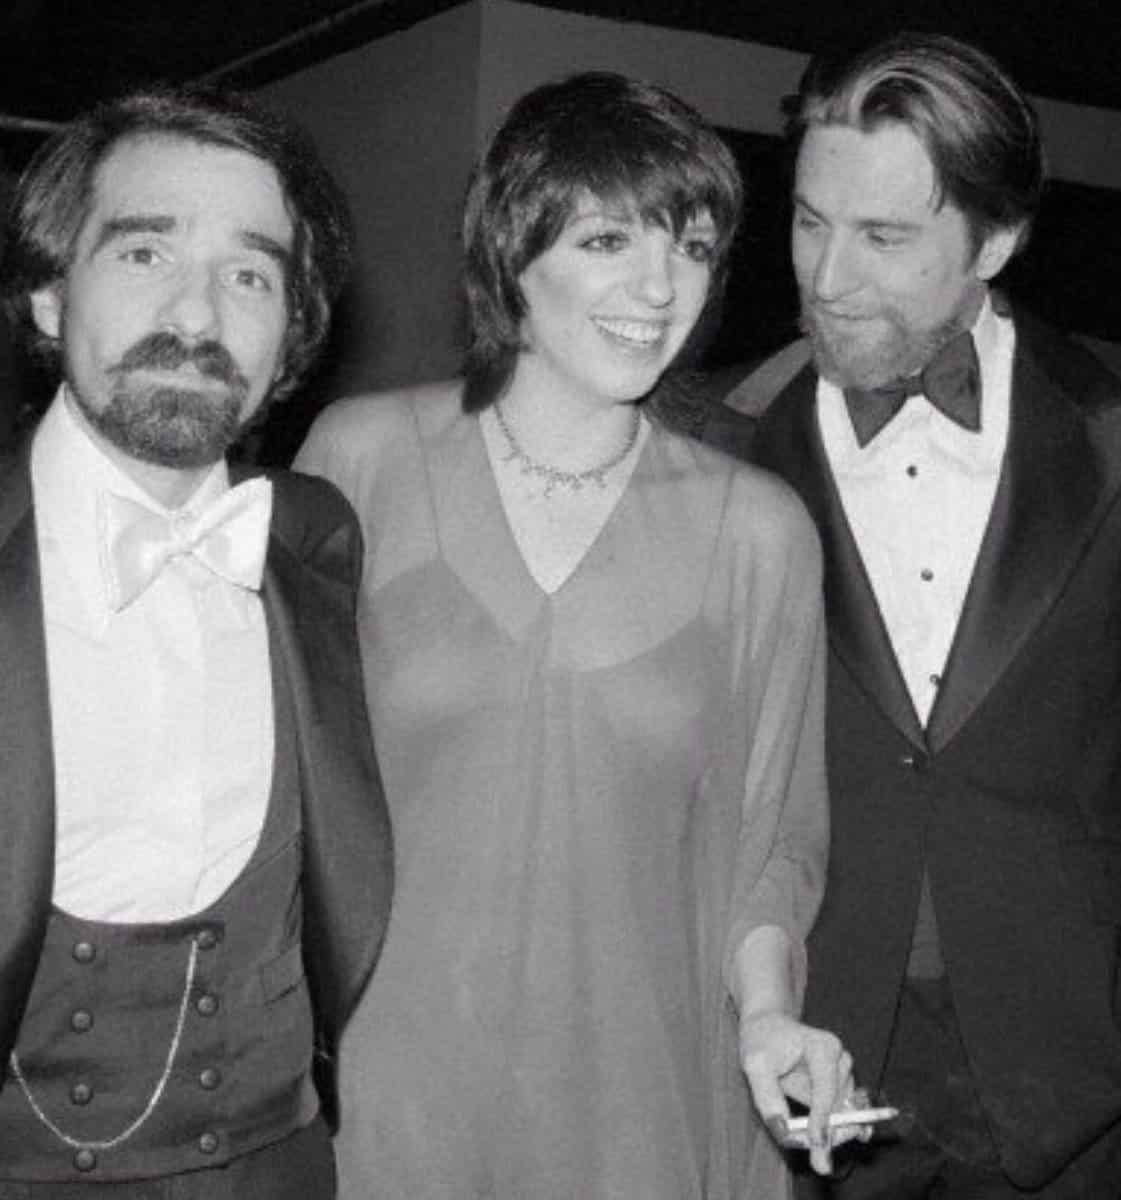 DJFFSTsXYAApnNz 24 Things You Didn't Know About Robert De Niro